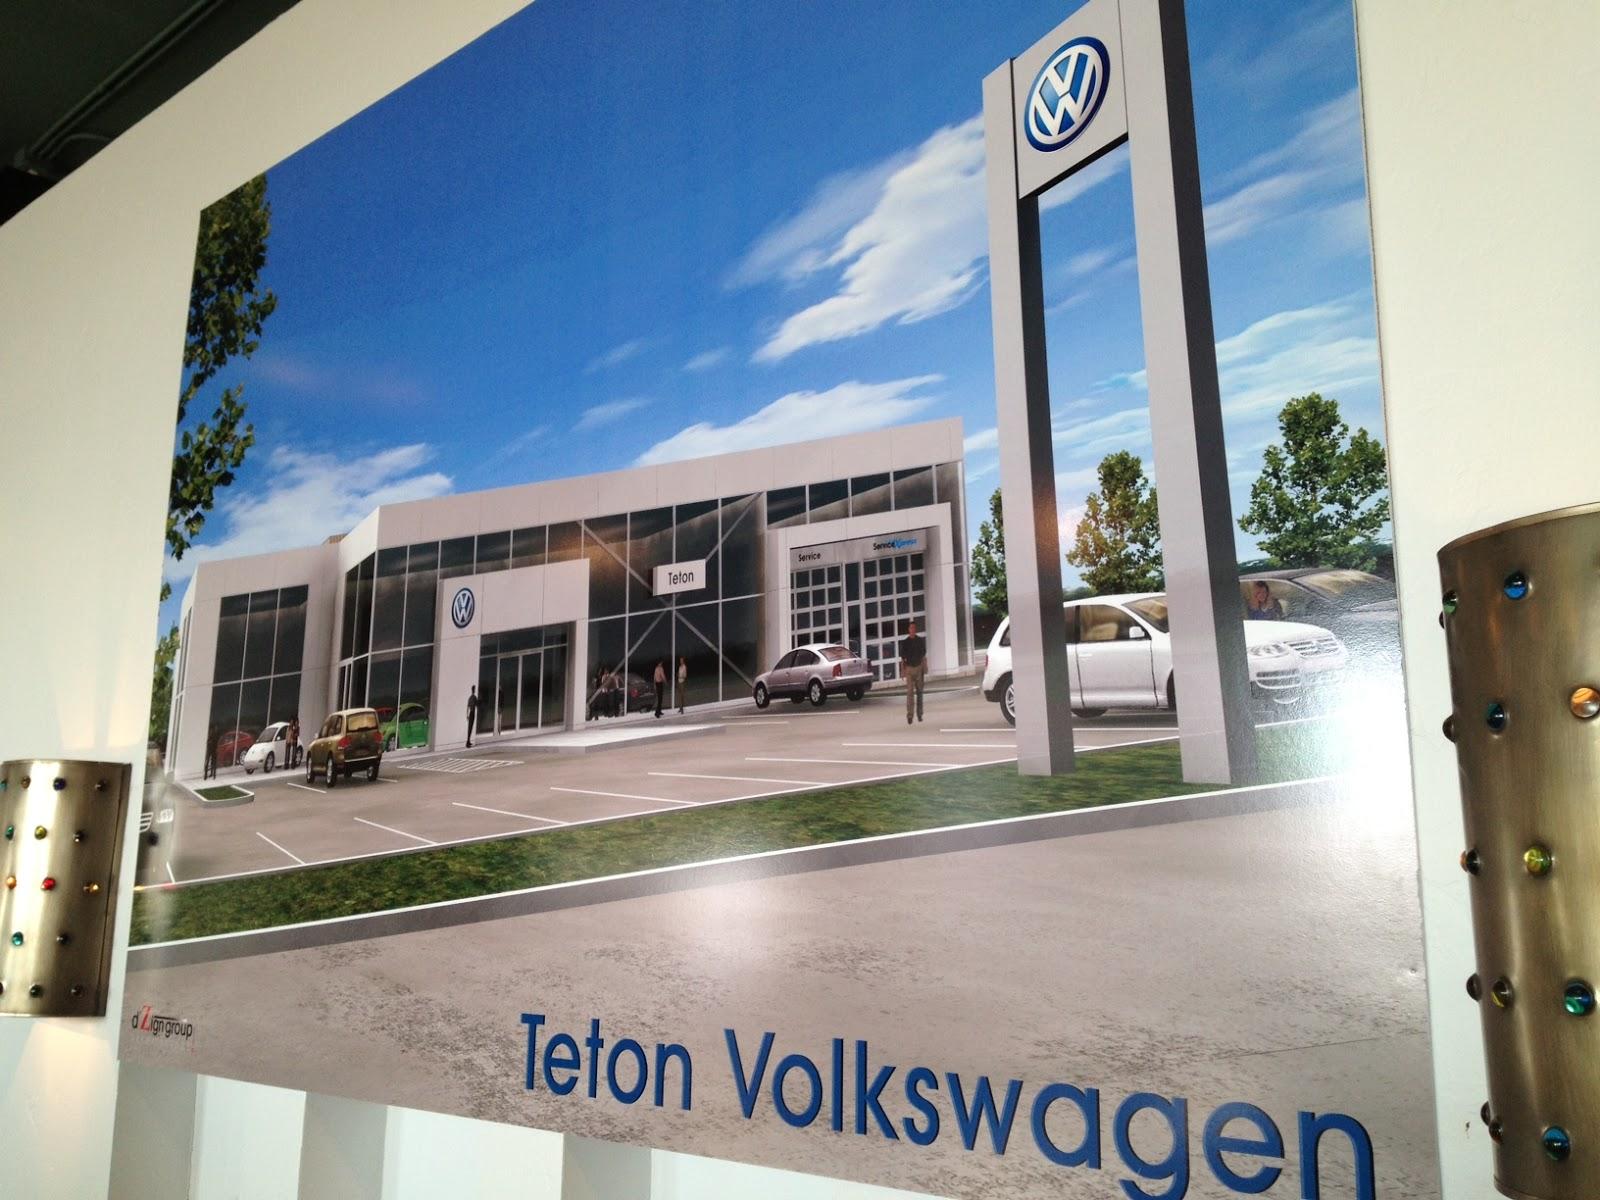 BizMojo Idaho: Teton Volkswagen hosts I.F. Chamber for ribbon cutting